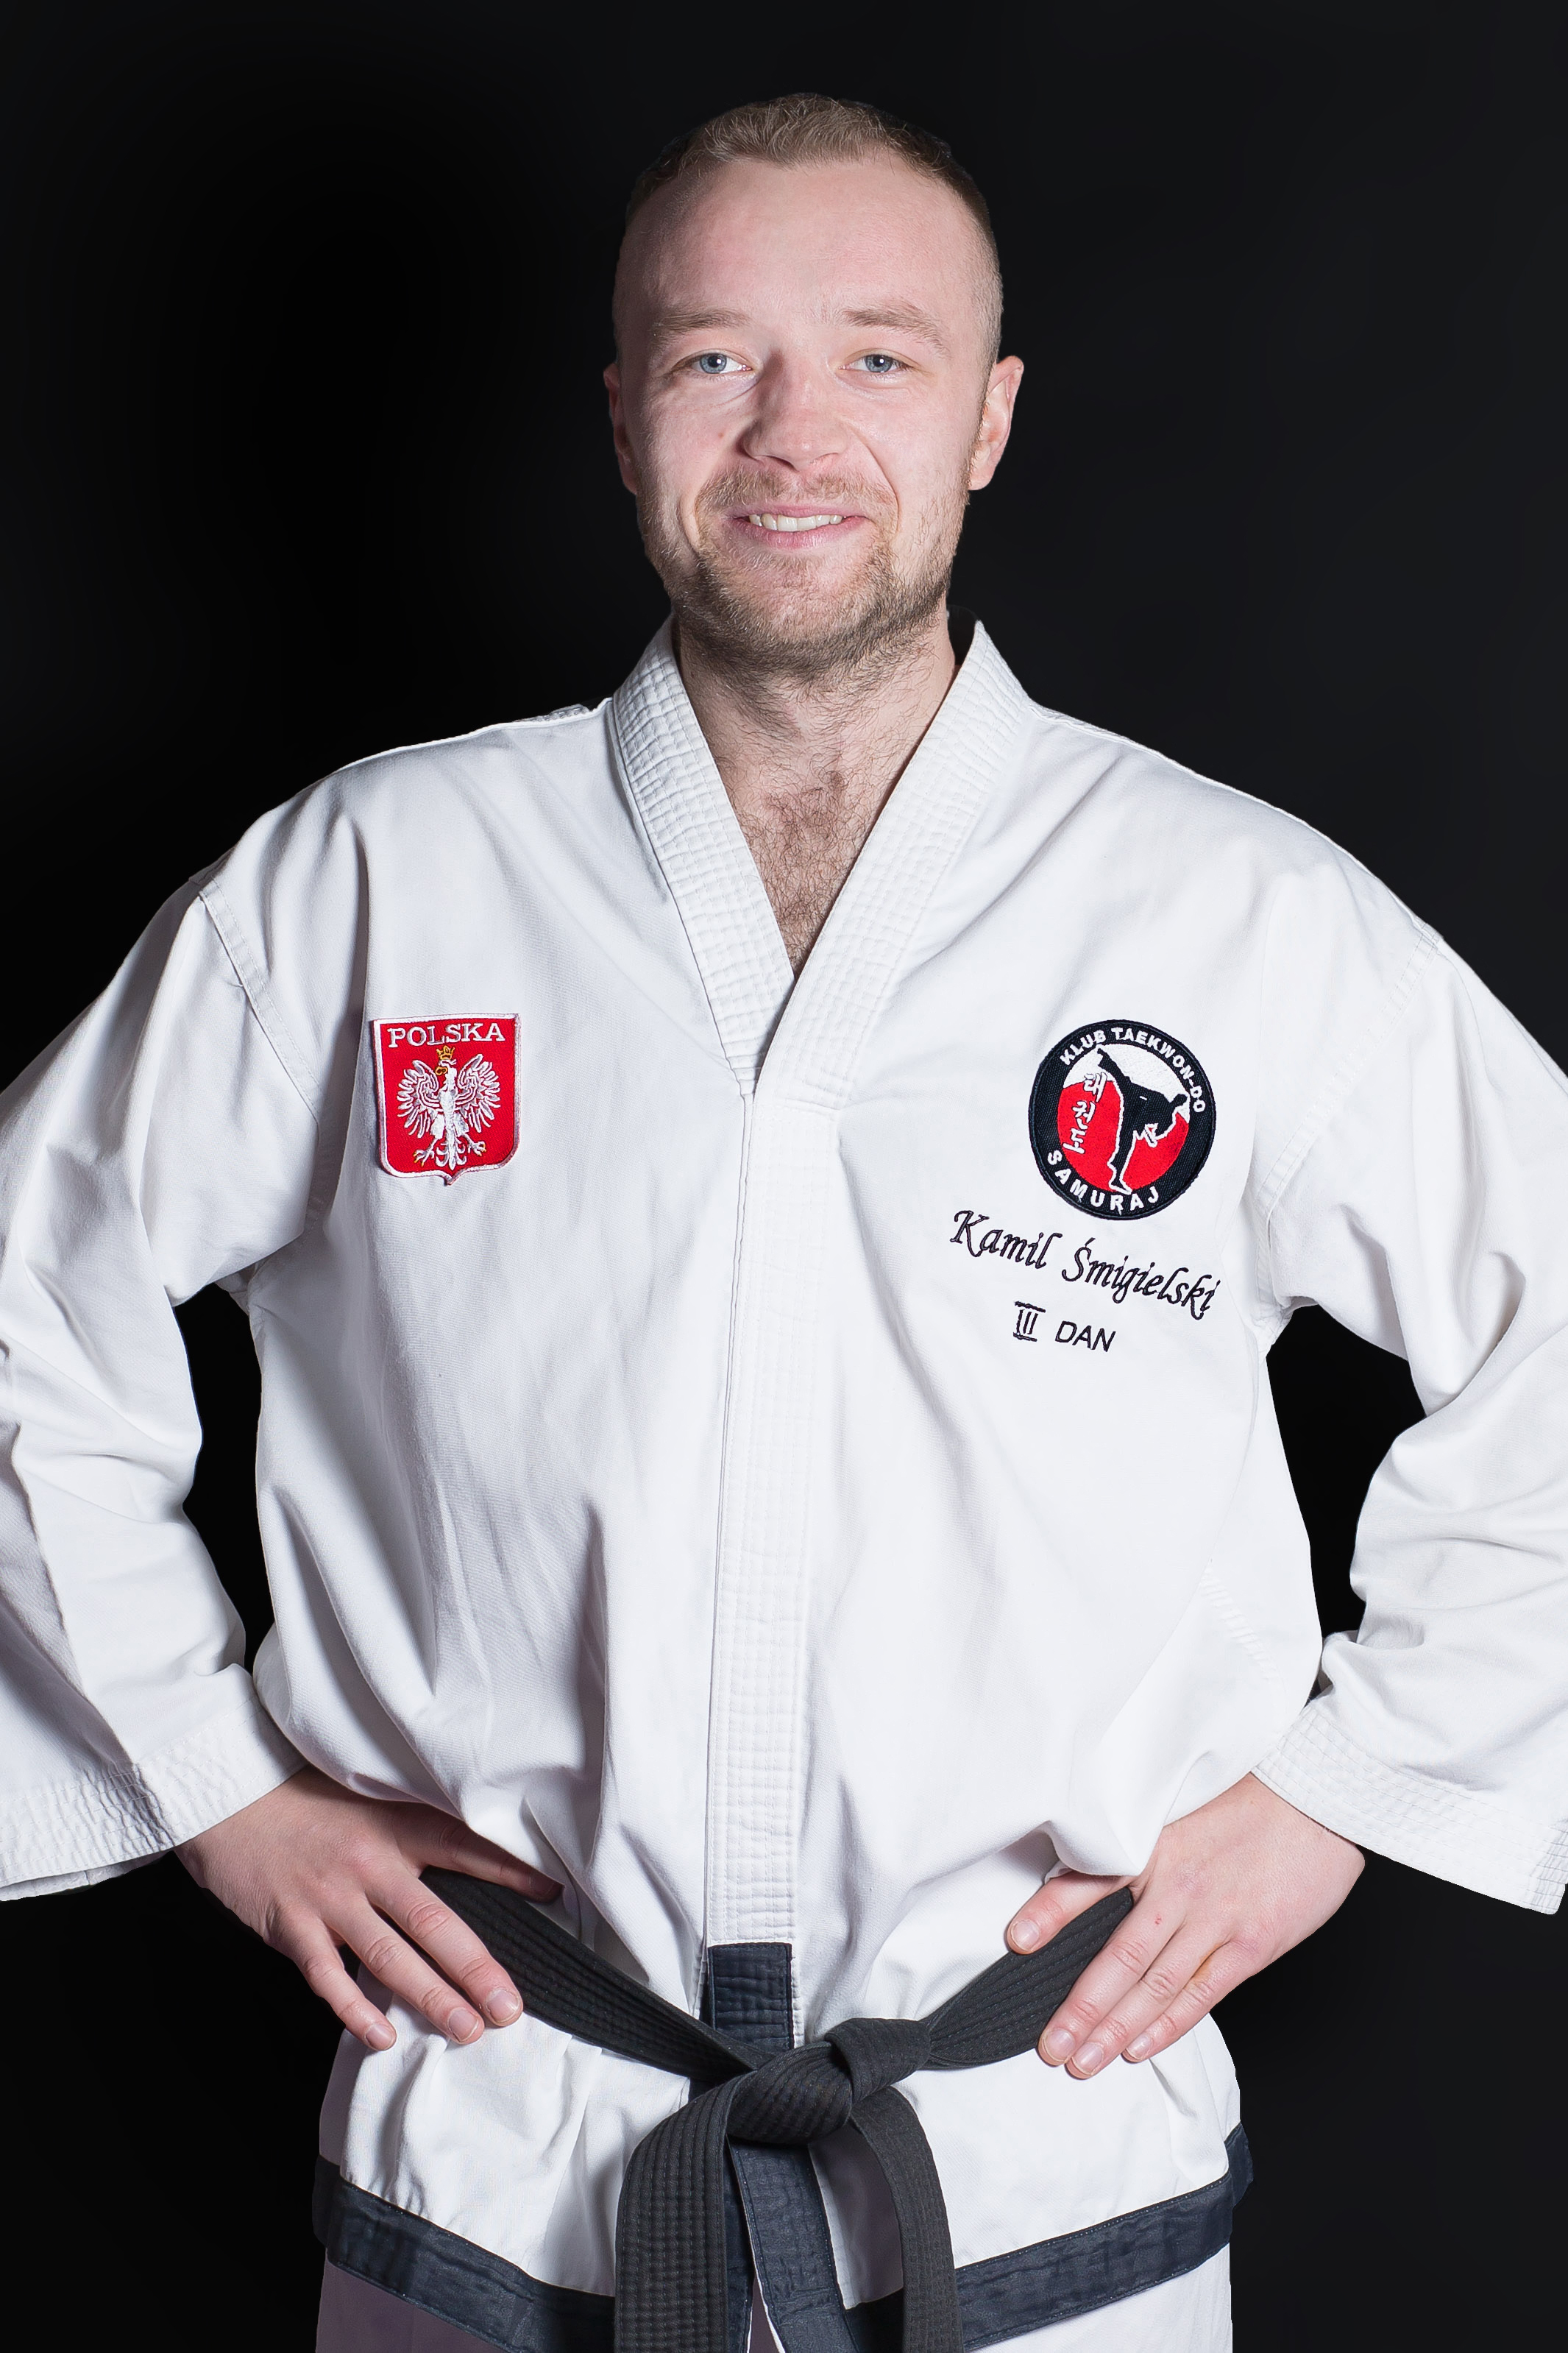 Kamil Śmigielski